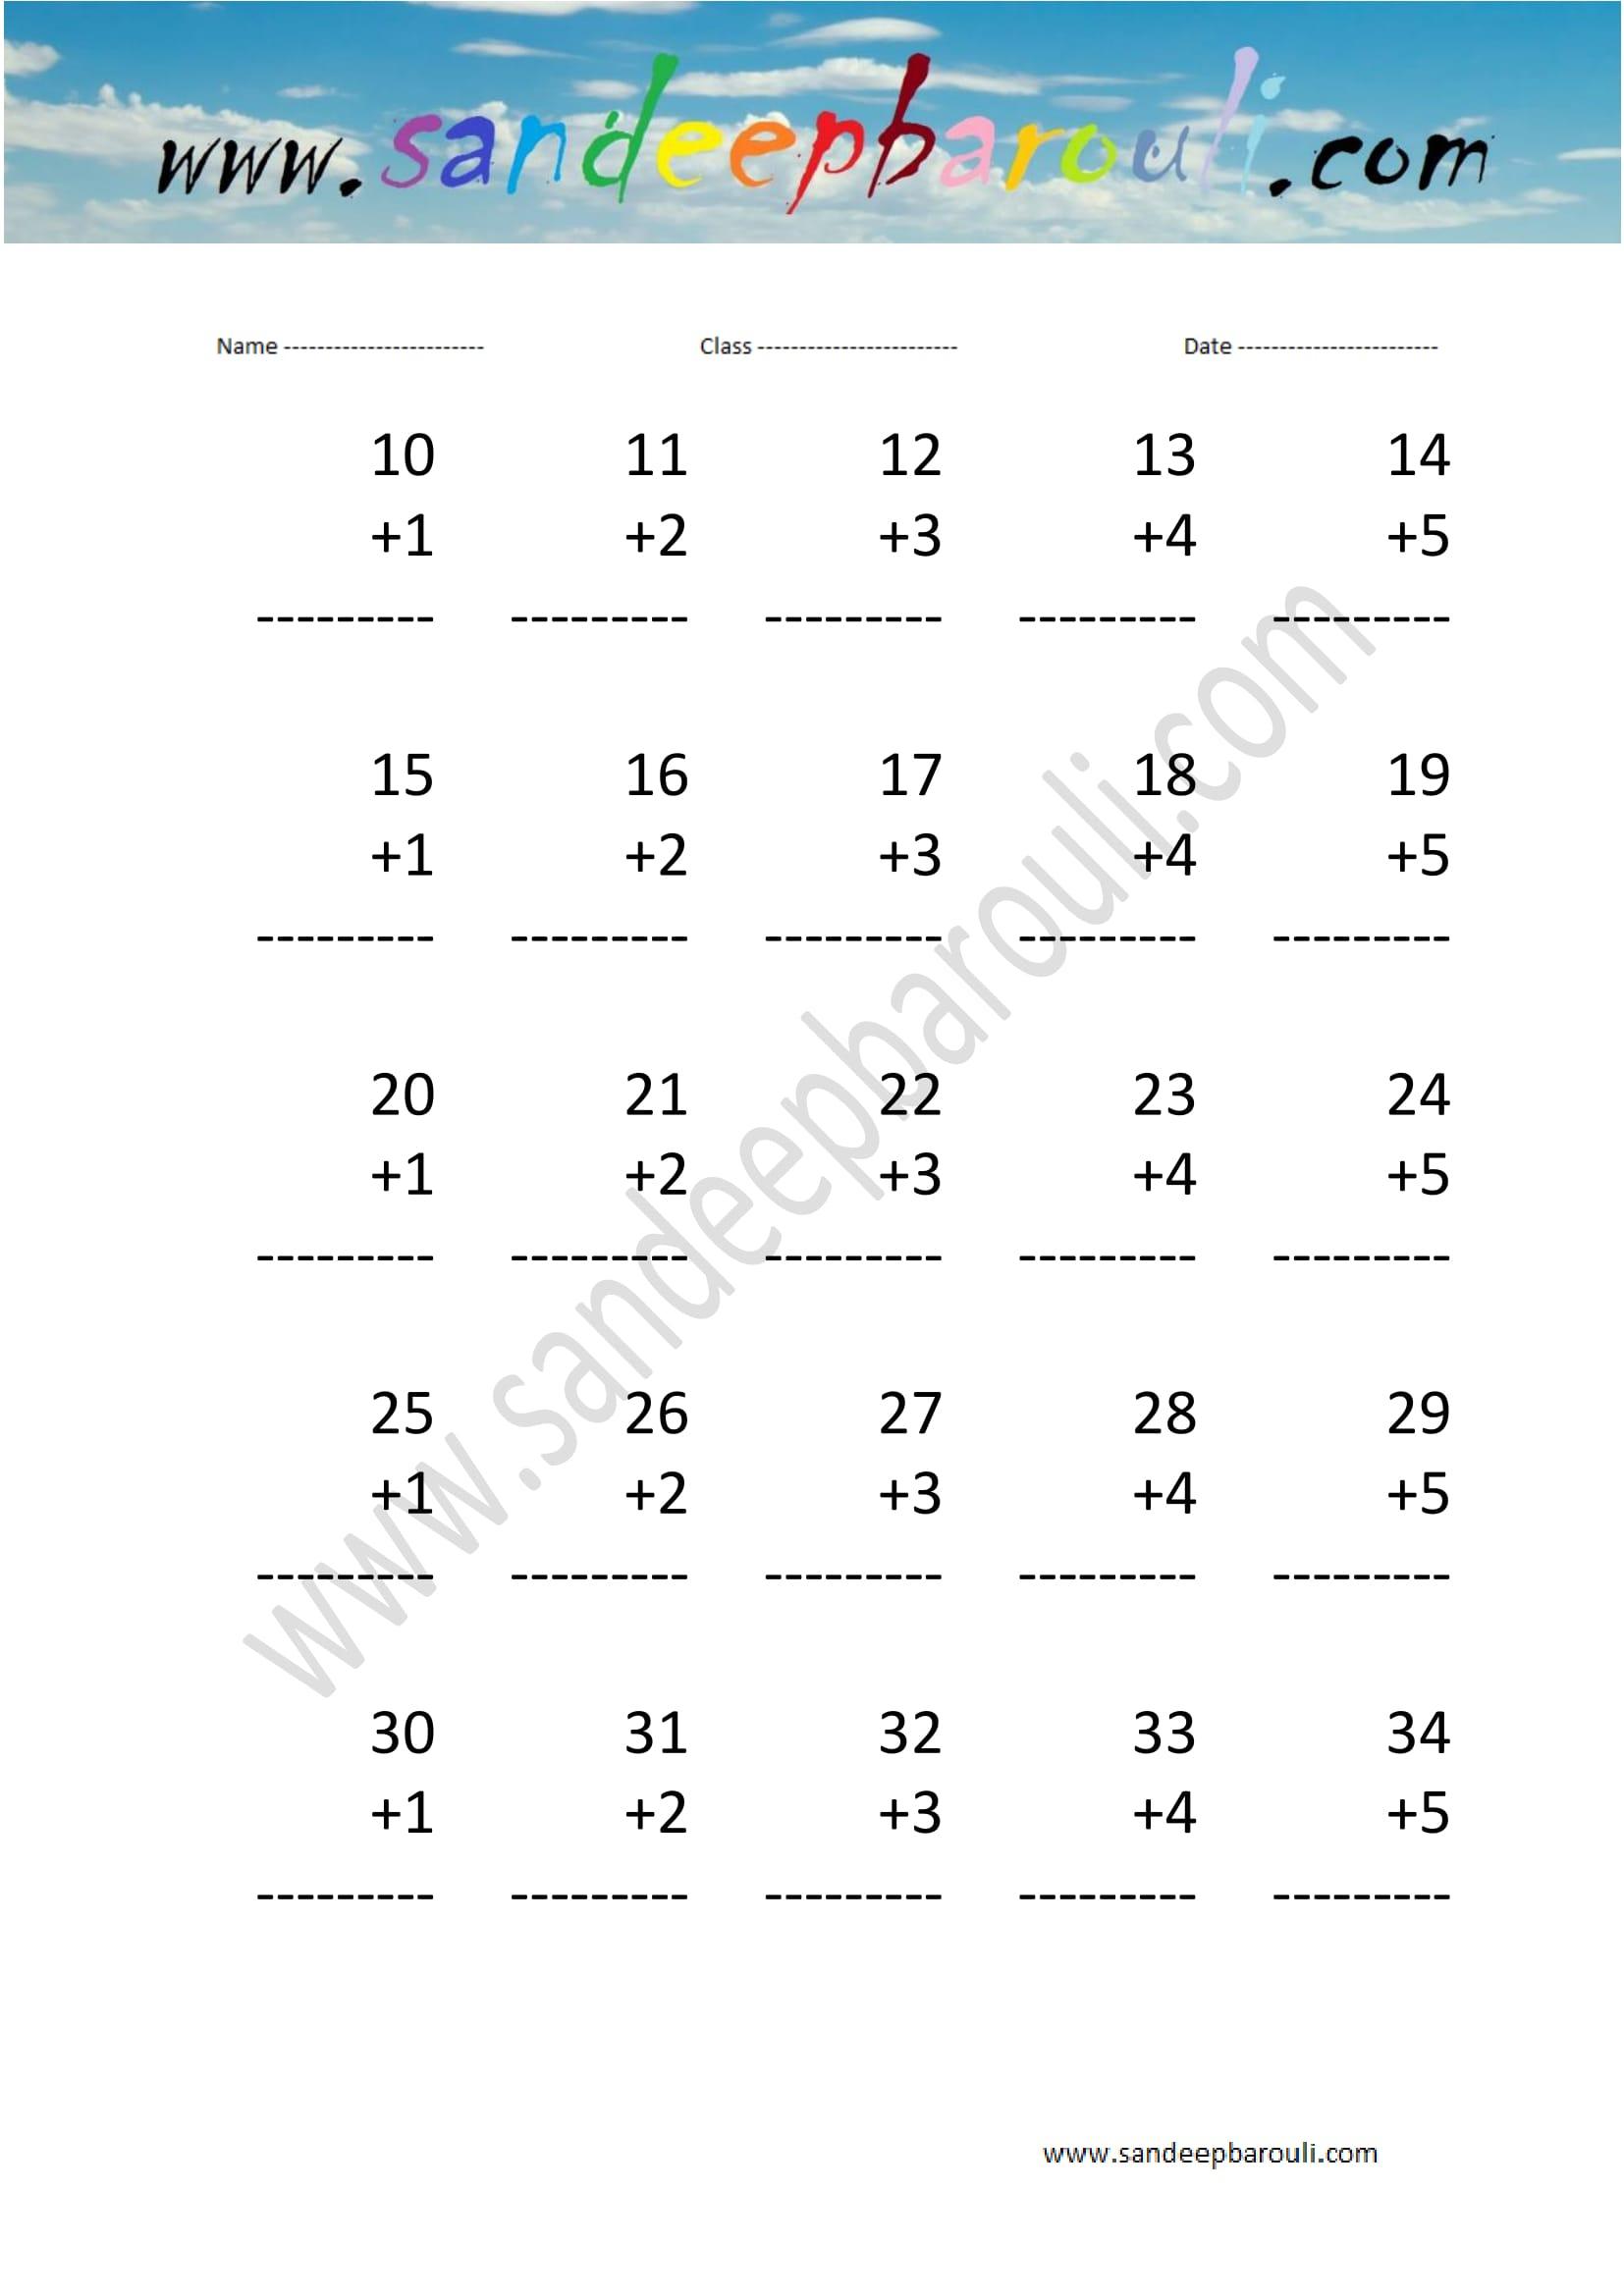 Math Worksheets For Kids 70 Sandeepbarouli